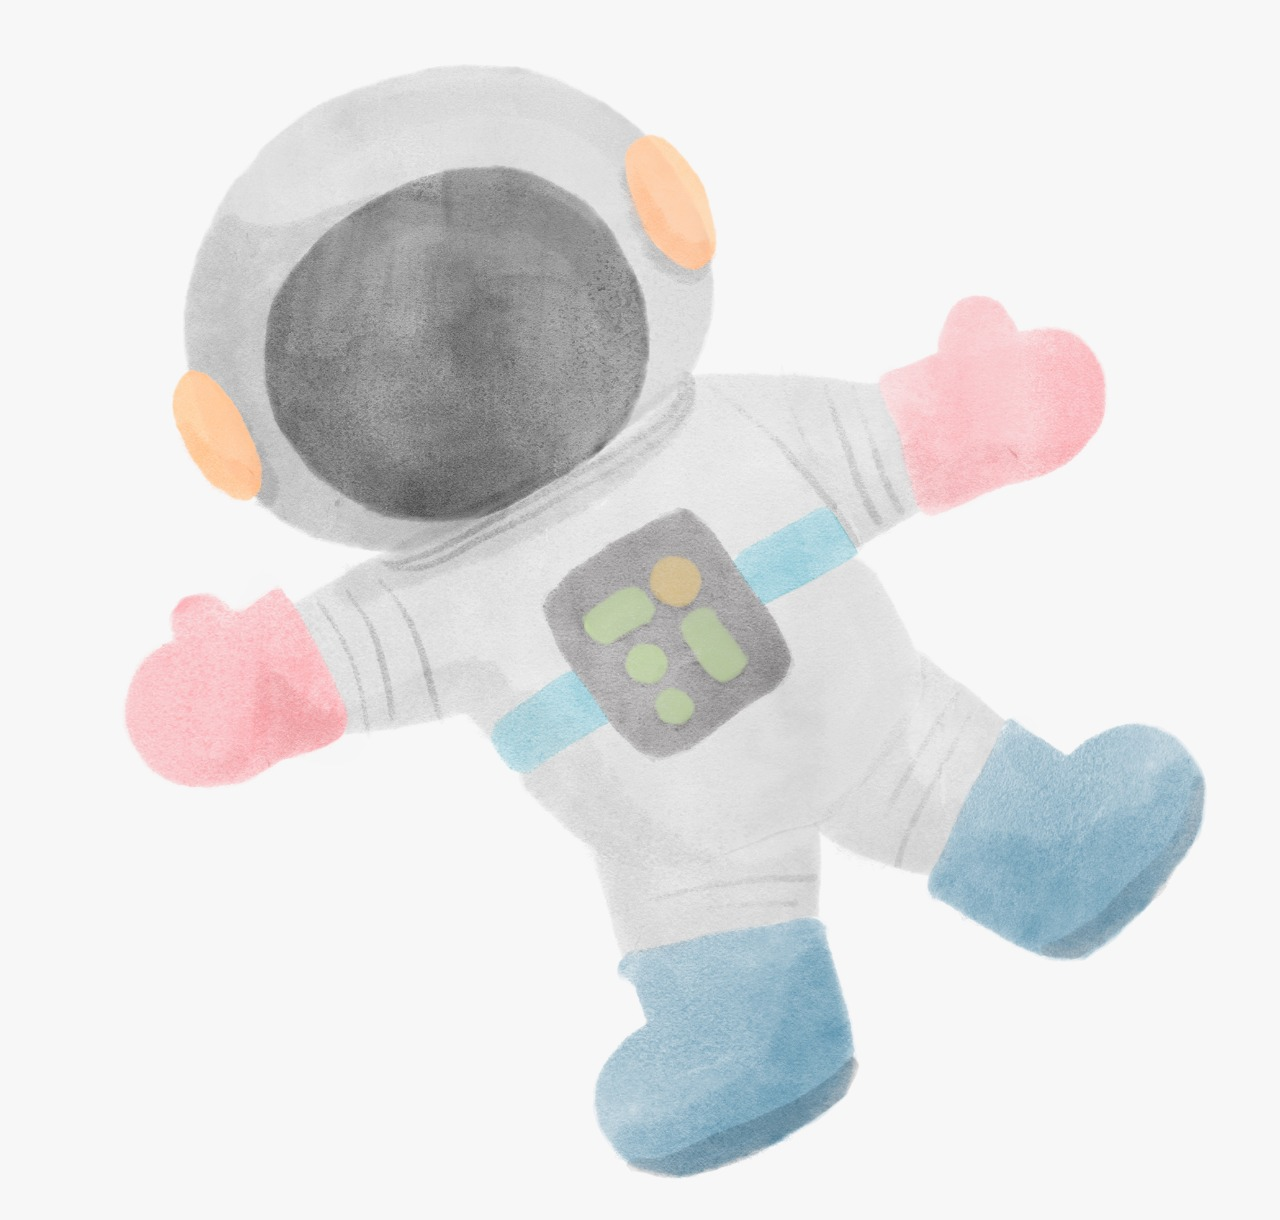 Adesivo Astronauta Gus